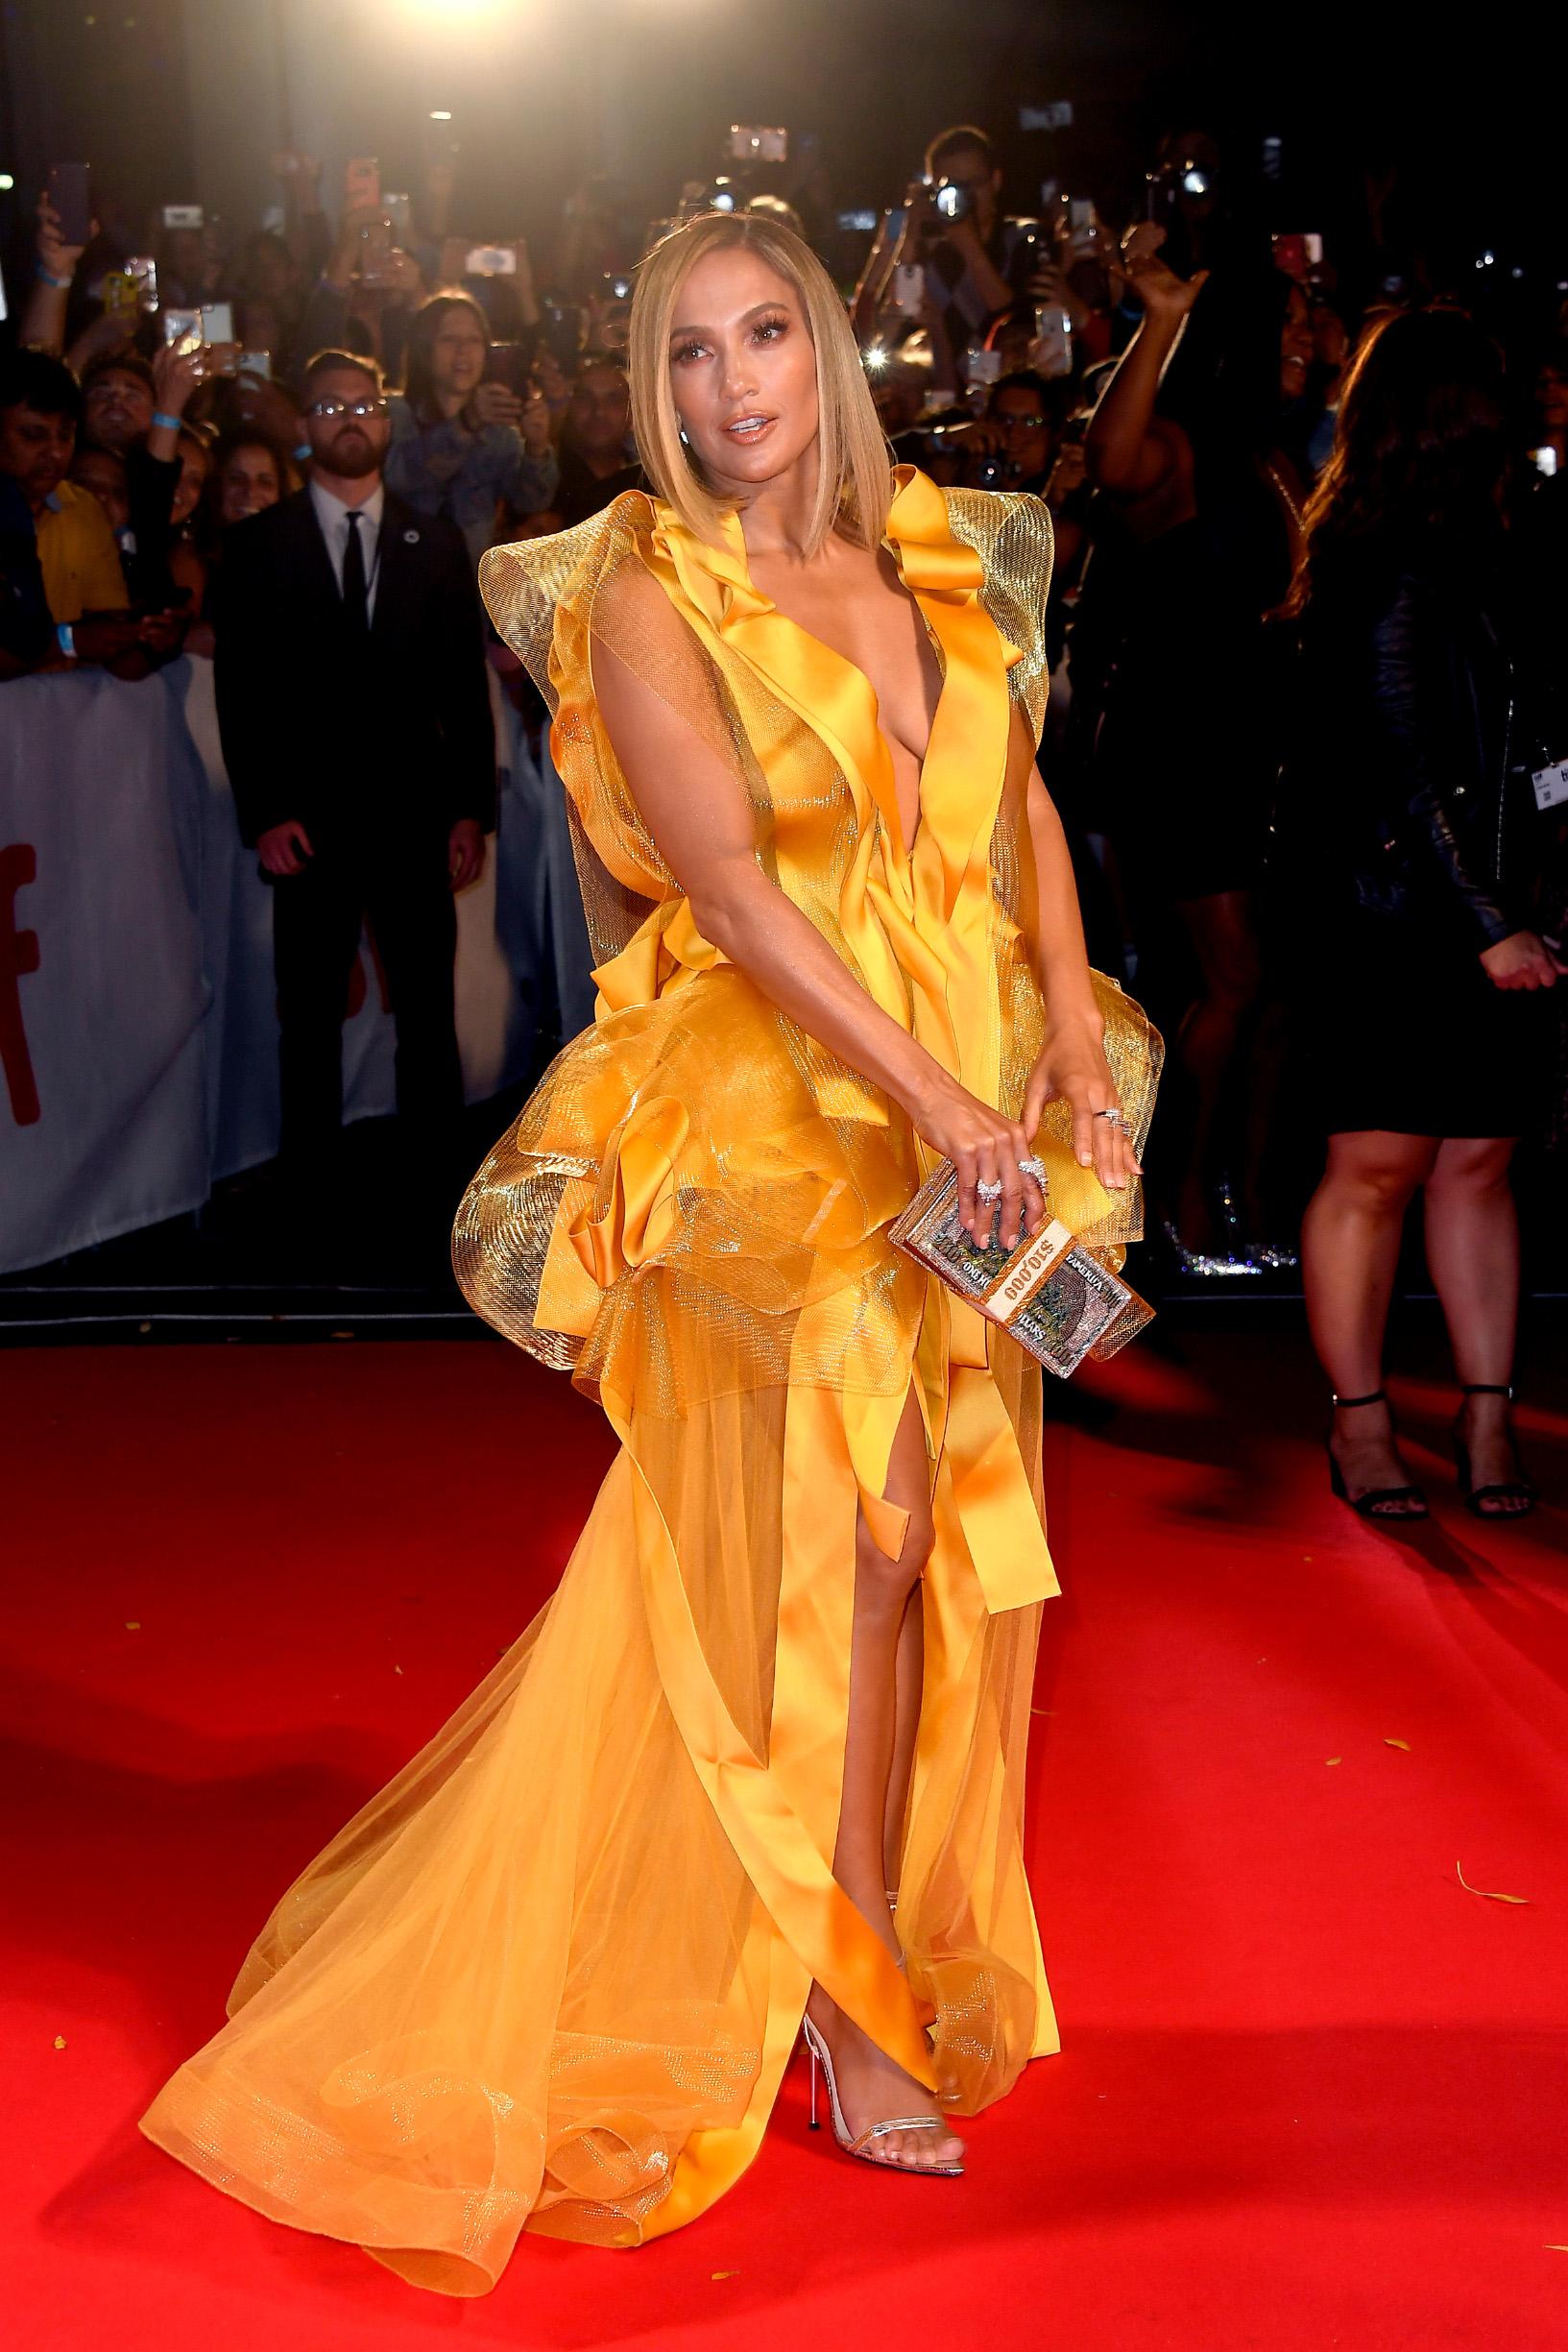 TORONTO, ONTARIO - SEPTEMBER 07:  Jennifer Lopez attends the